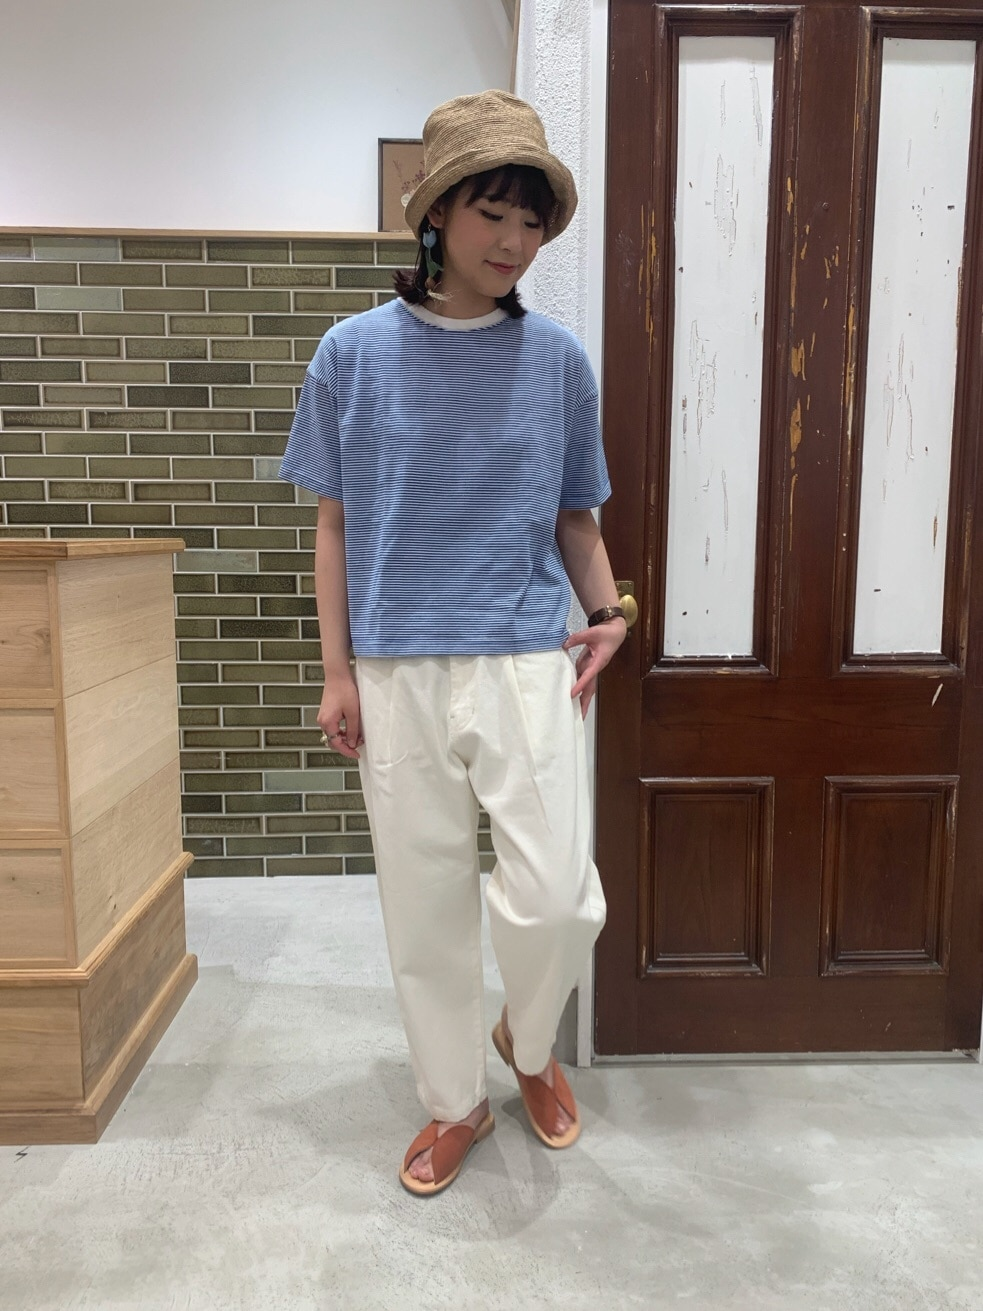 chambre de charme 横浜ジョイナス 身長:162cm 2020.05.16